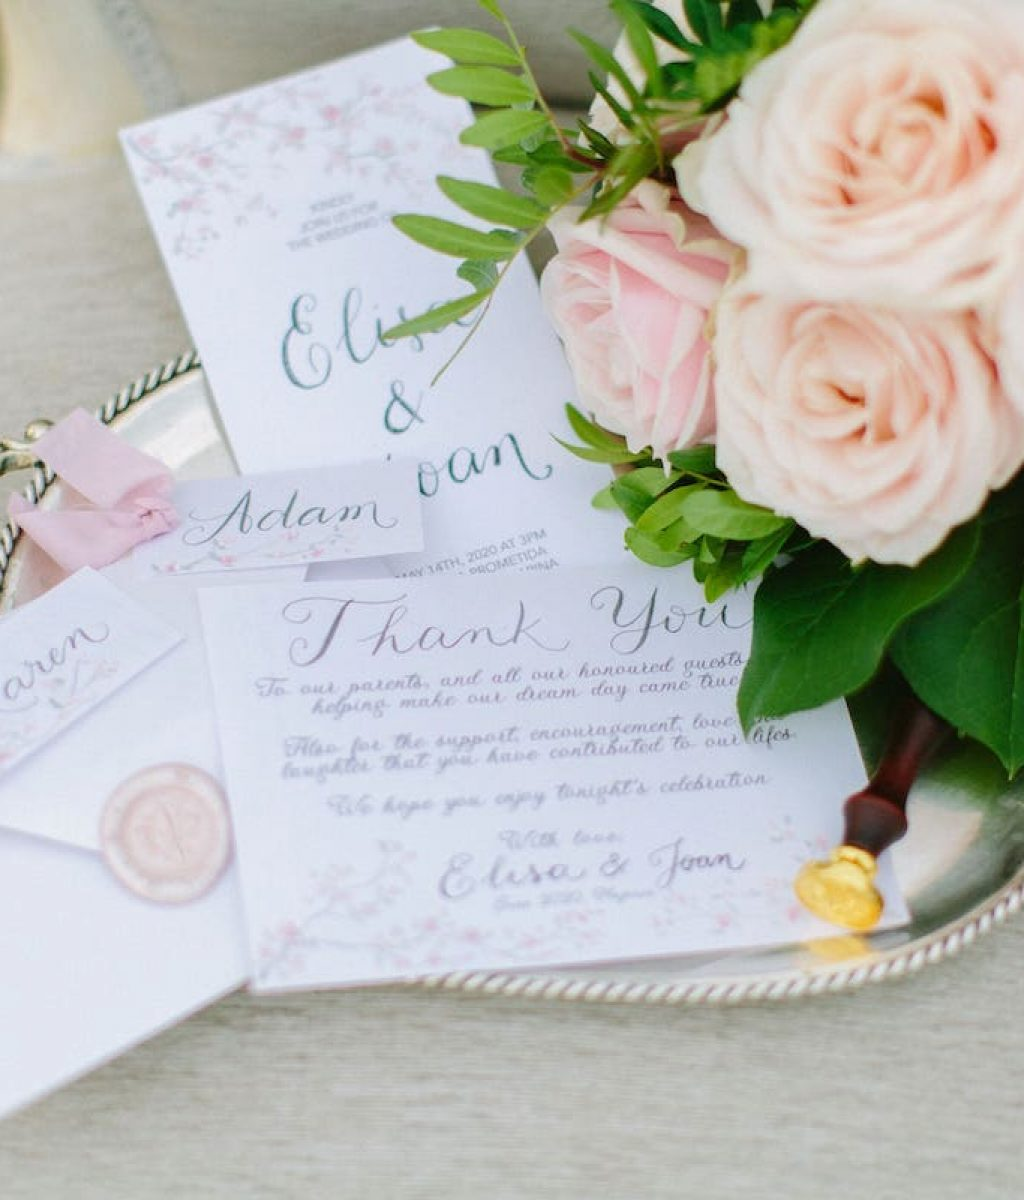 ideas de invitación para bodas y eventos en Mallorca